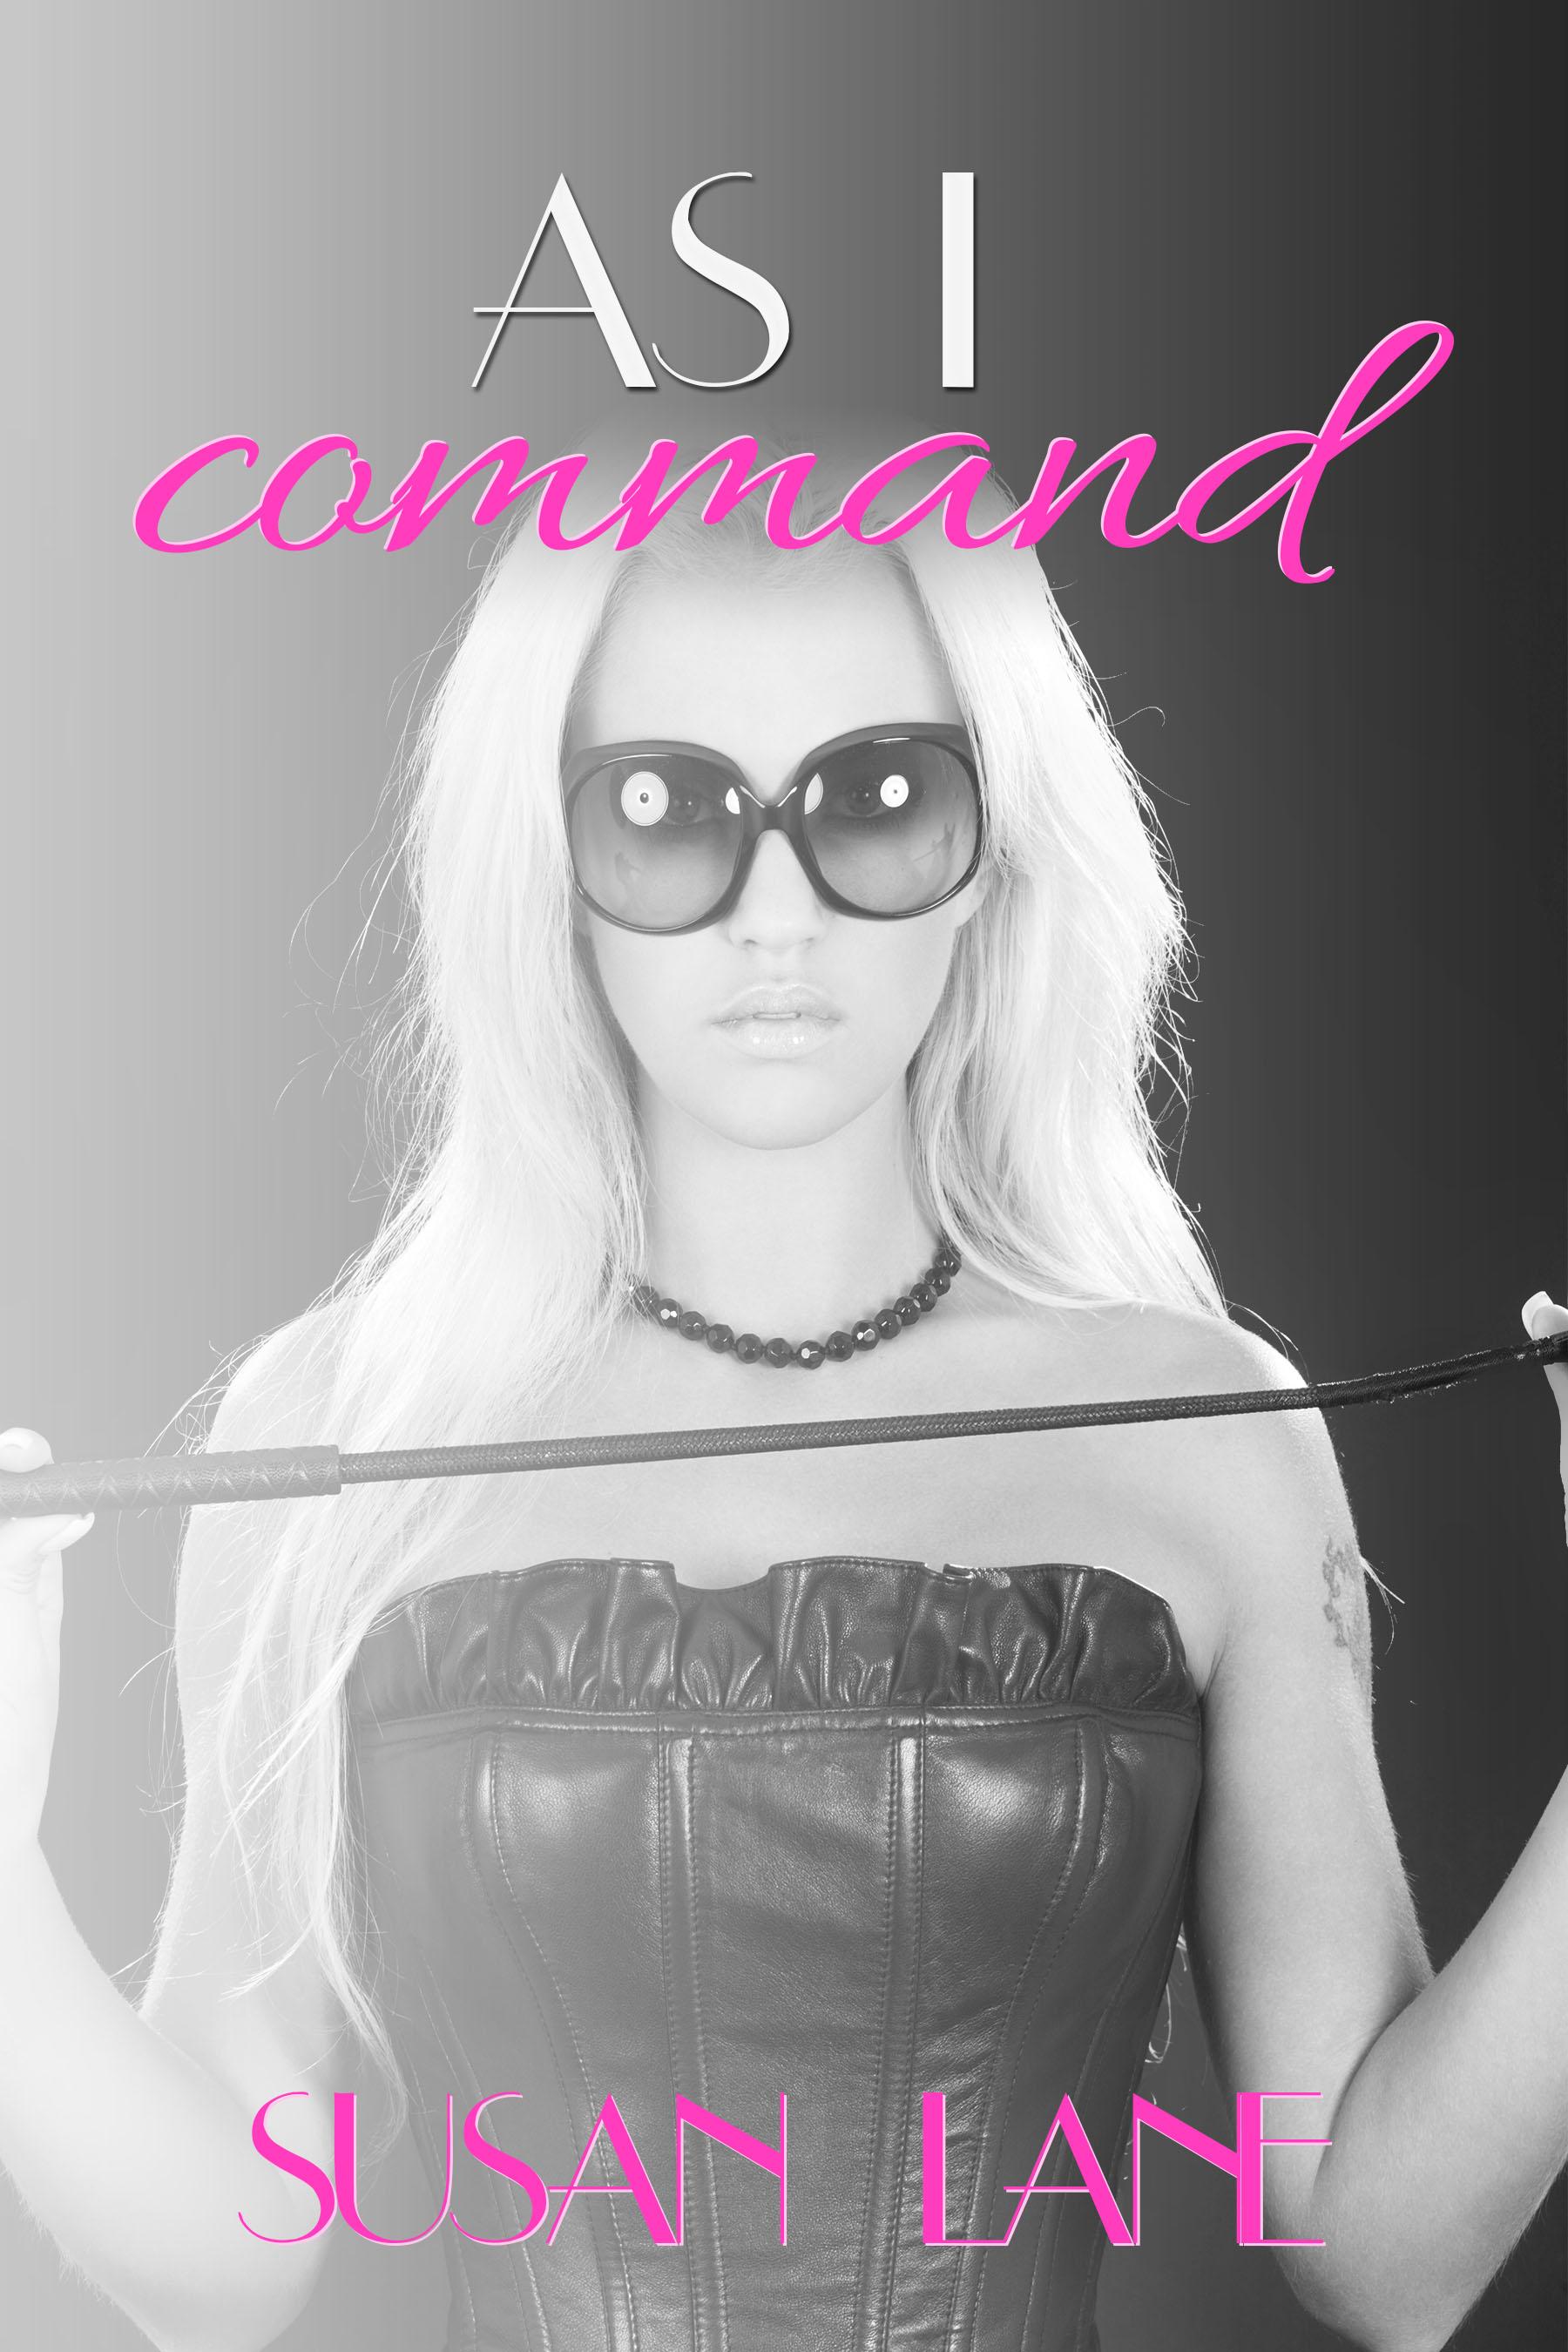 As I Command